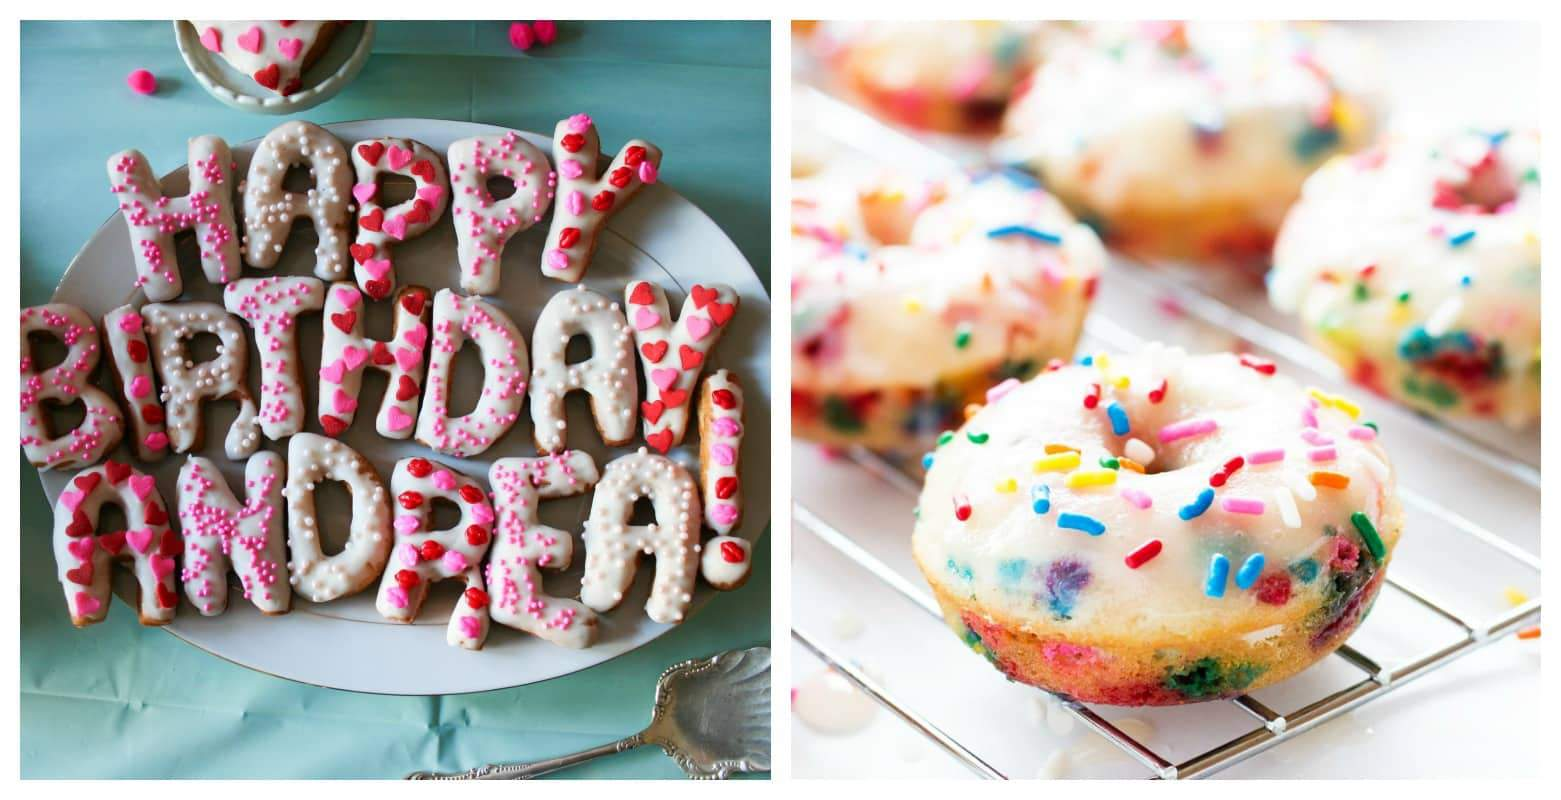 Happy-Birthday-Barbie-Pink-Pancake-collage-Kids-Activities-Blog